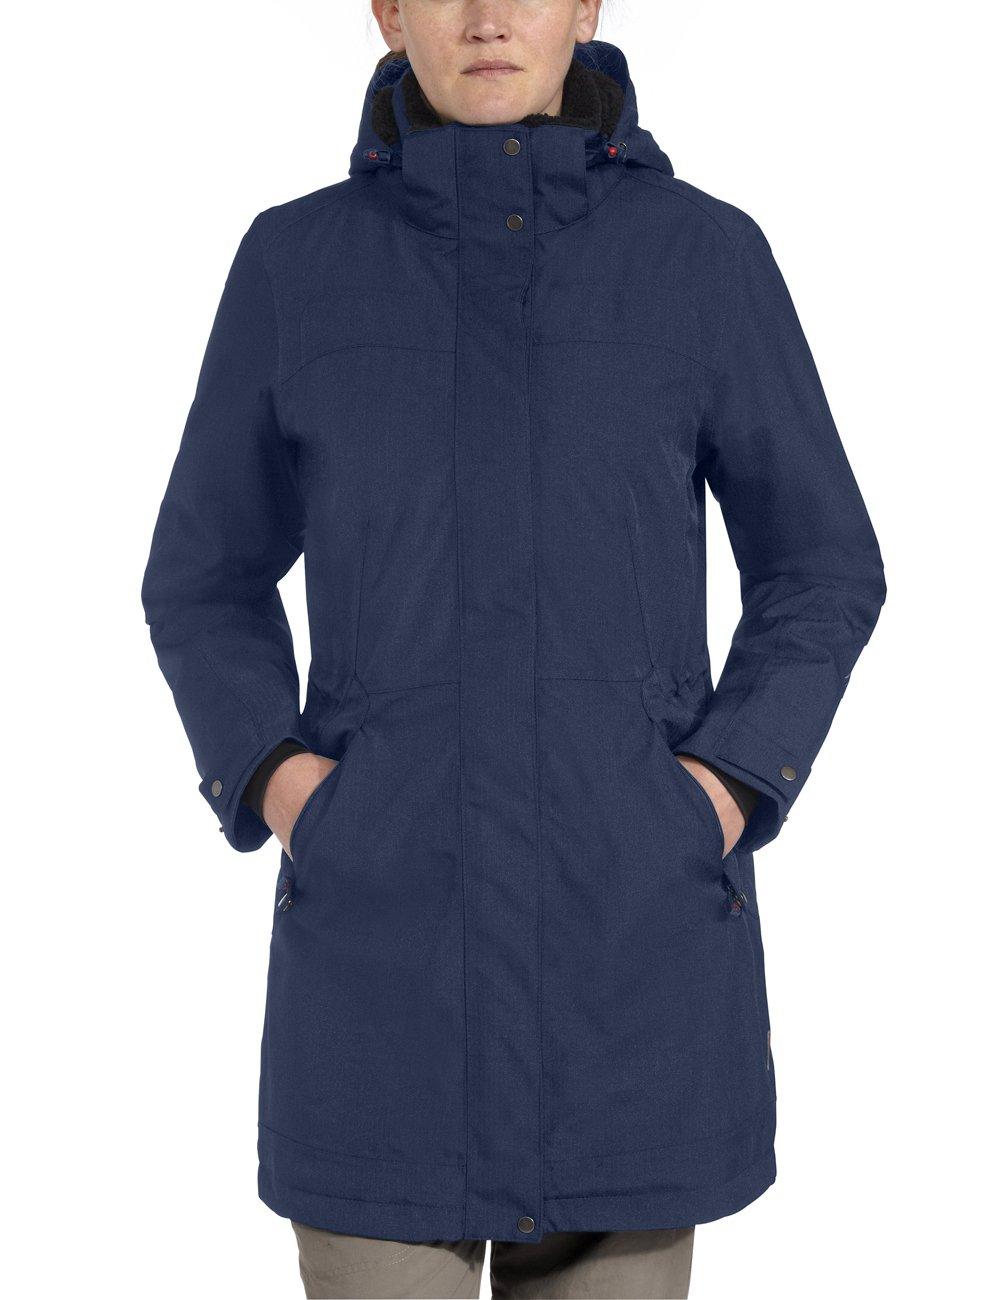 maier sports Damen Outdoor Mantel Lisa jetzt kaufen